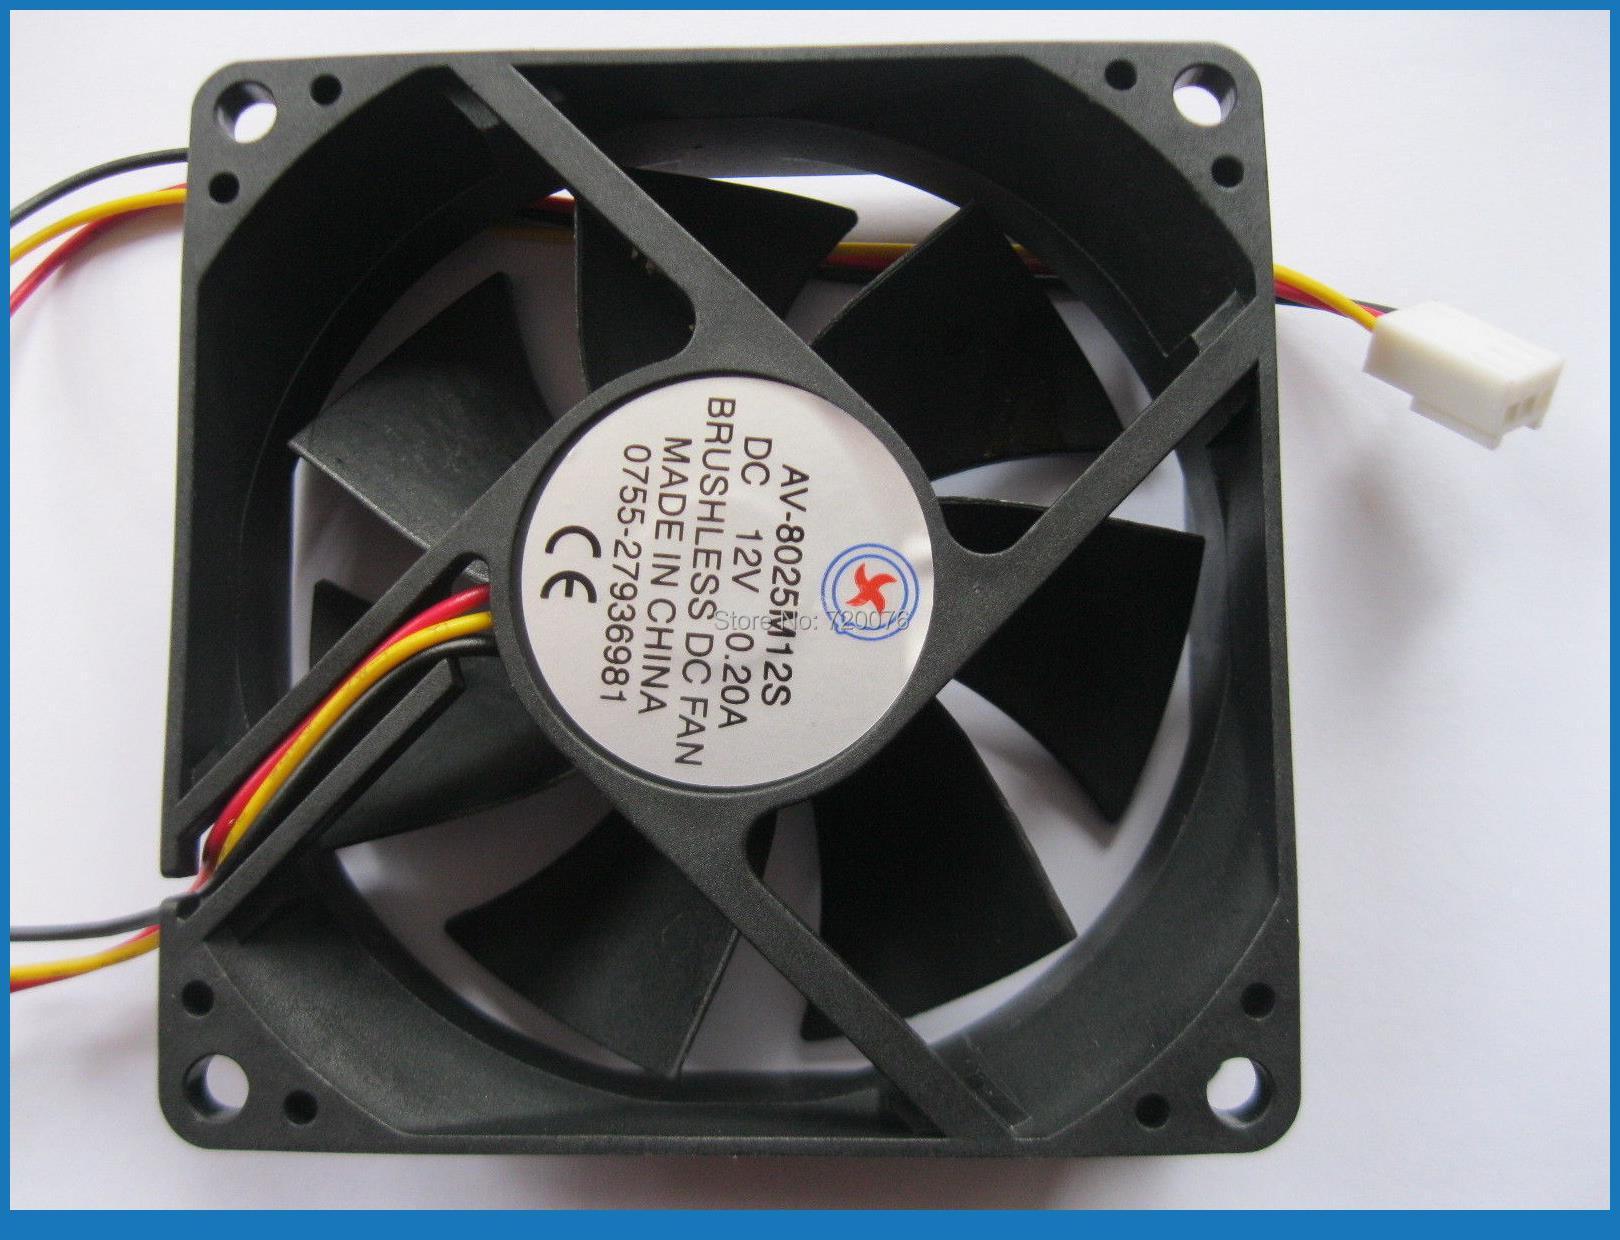 30 pcs Brushless DC Cooling 7 Blade Fan 8025S 12V 80x80x25mm 3 Wires 80 x 80 x 25mm 12v 2 pin brushless cooling fan for computer cpu system heatsink brushless cooling fan 8025